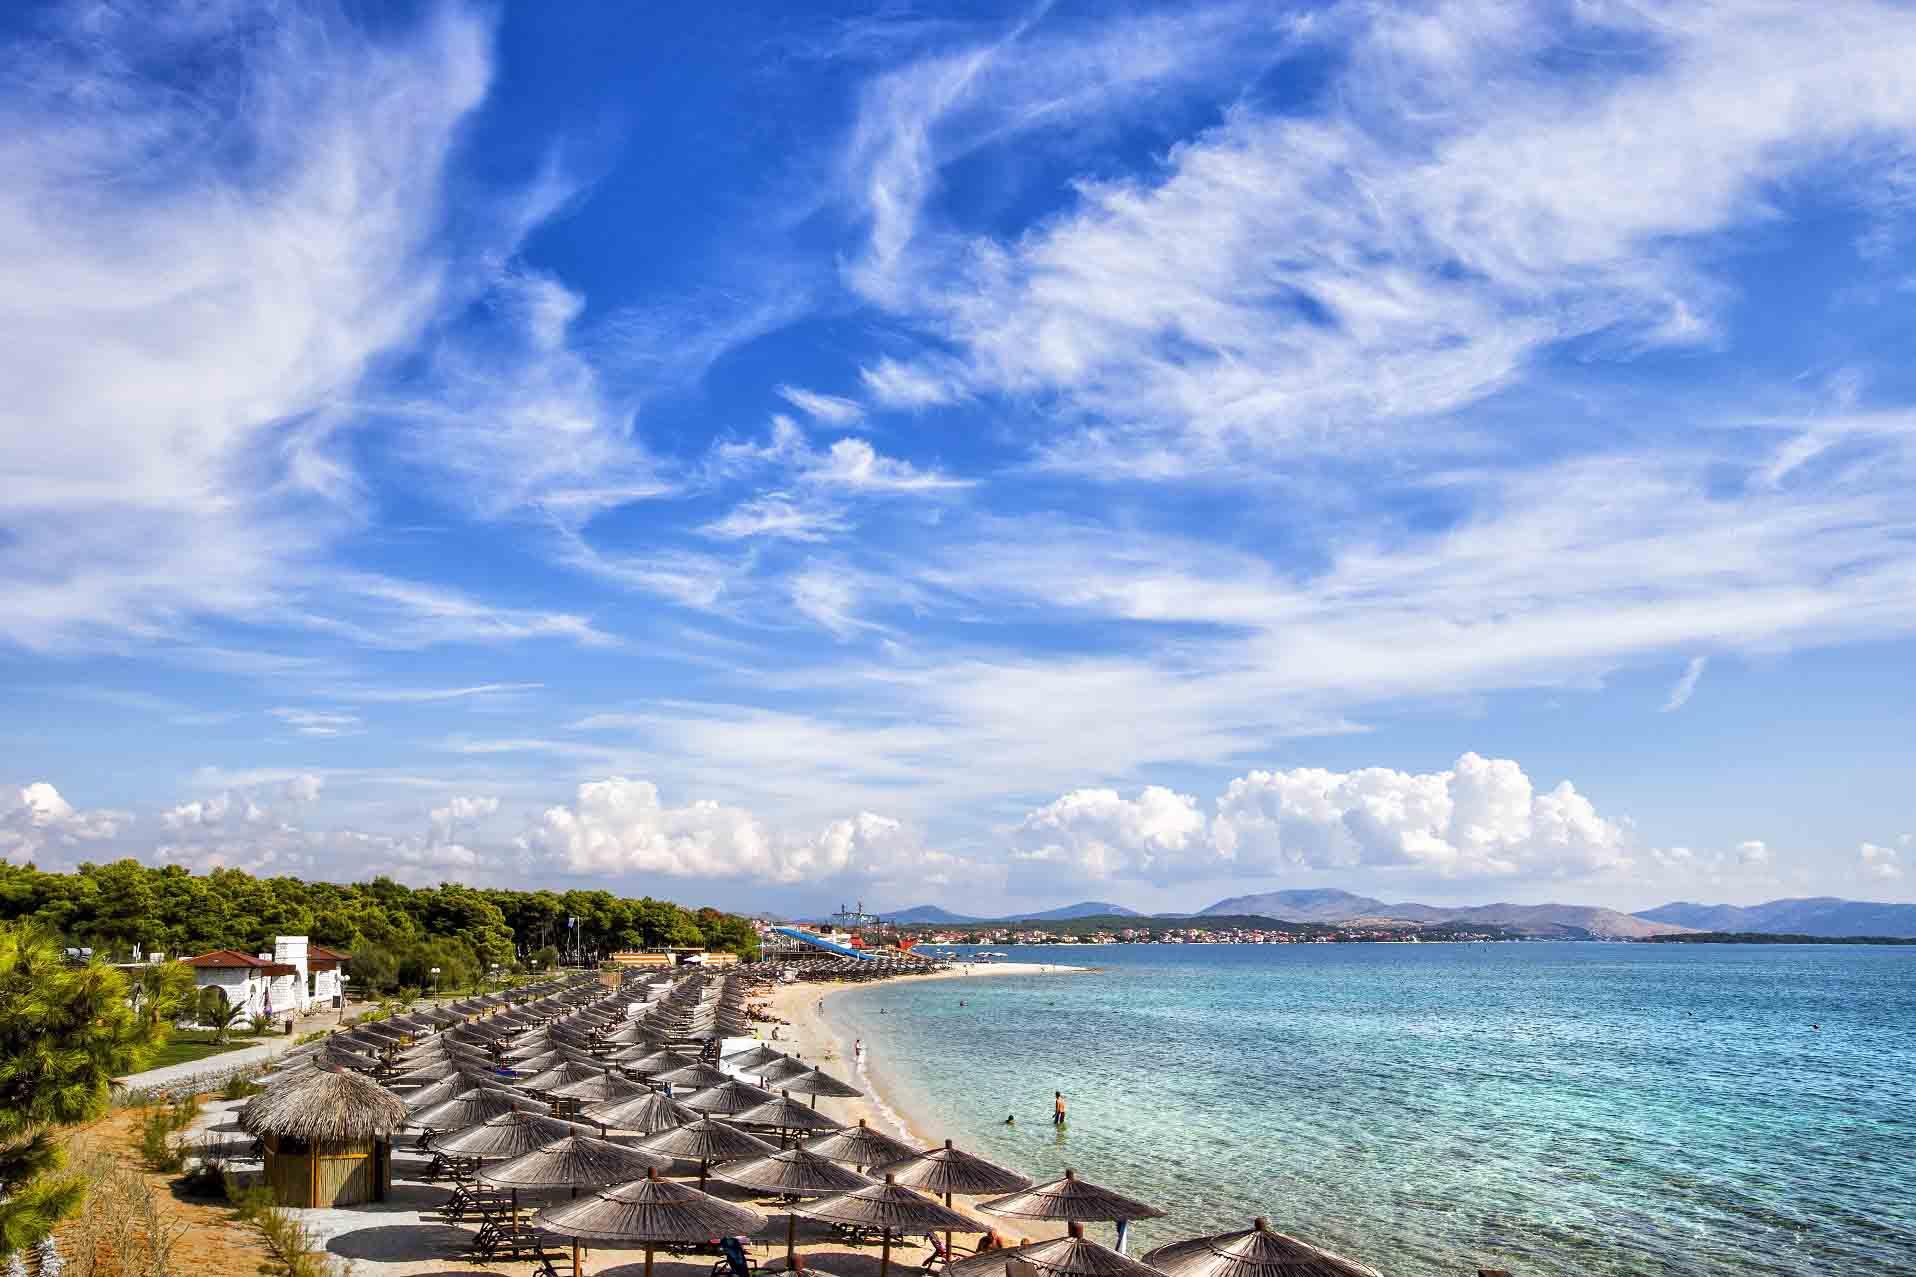 1001-solaris-beach-resort-solaris-sand-beach.jpg